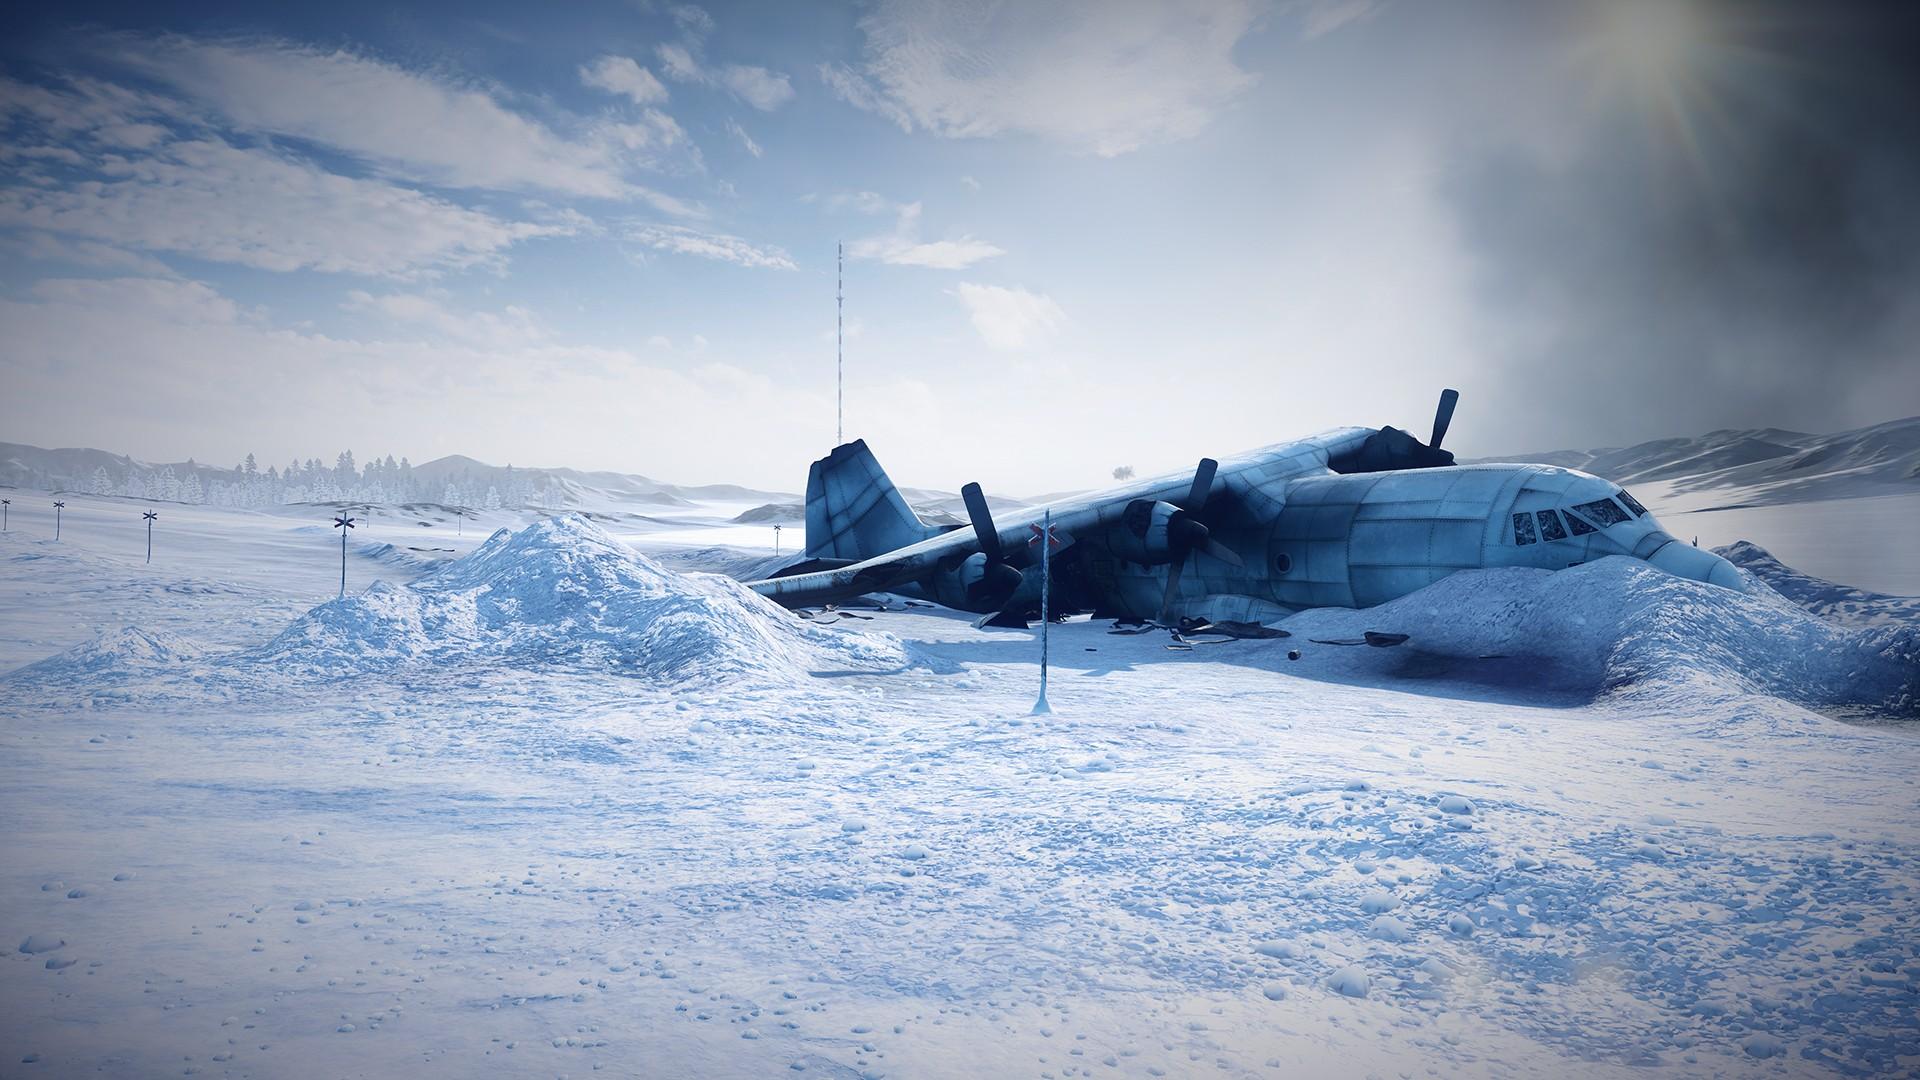 Airplane Plane Snow Crash Accident Winter dark horror plane wallpaper 1920x1080